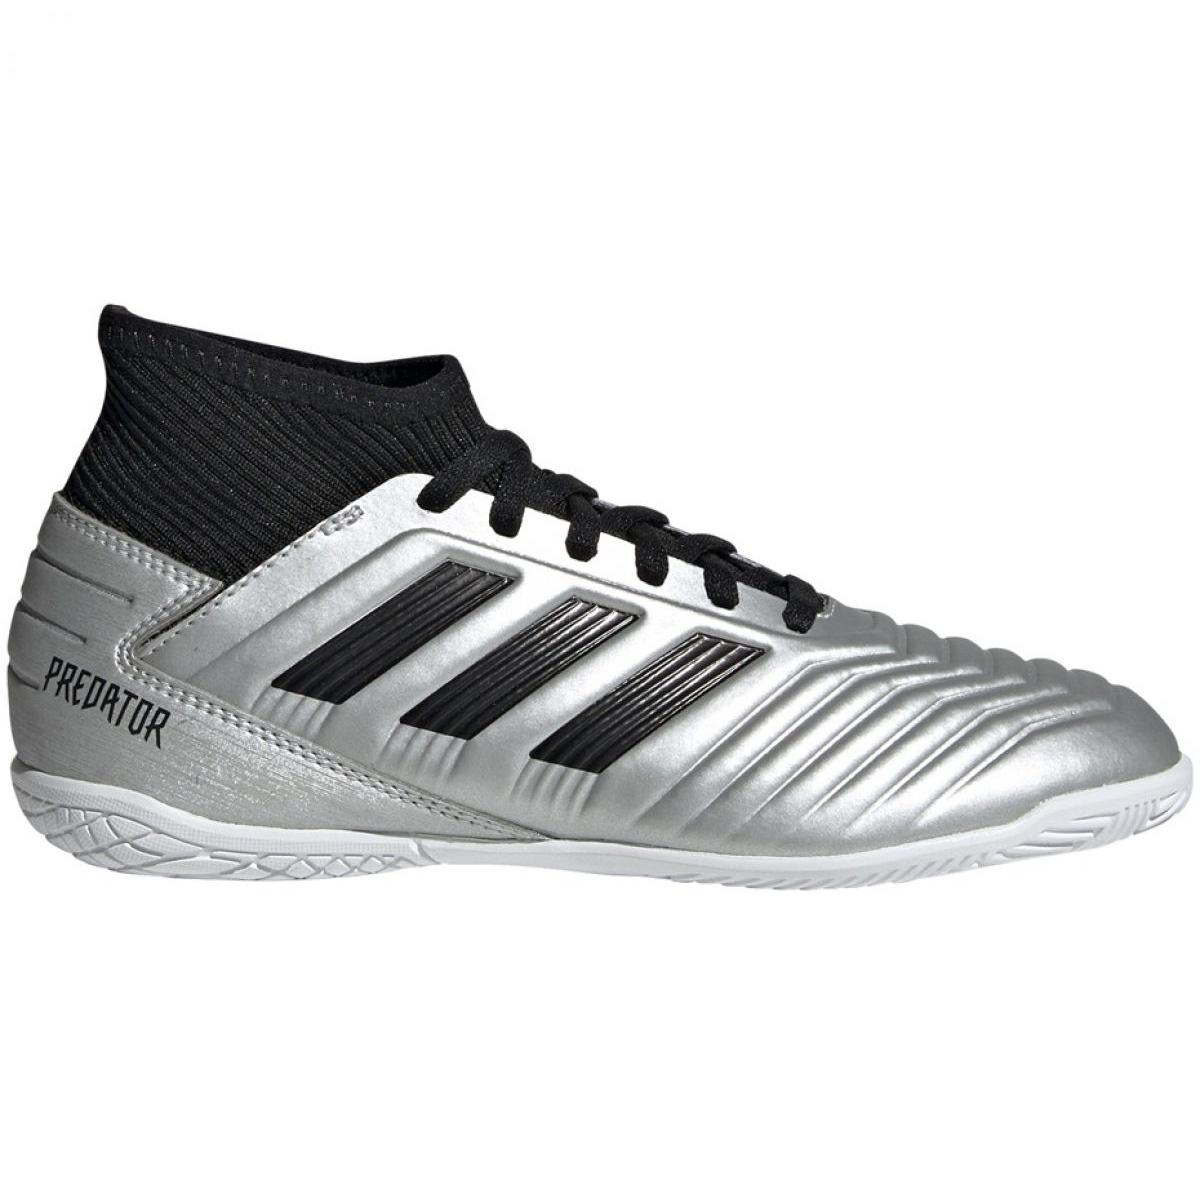 Hallenschuhe Adidas Predator 19 3 In Jr G25806 Grau Silber Silber